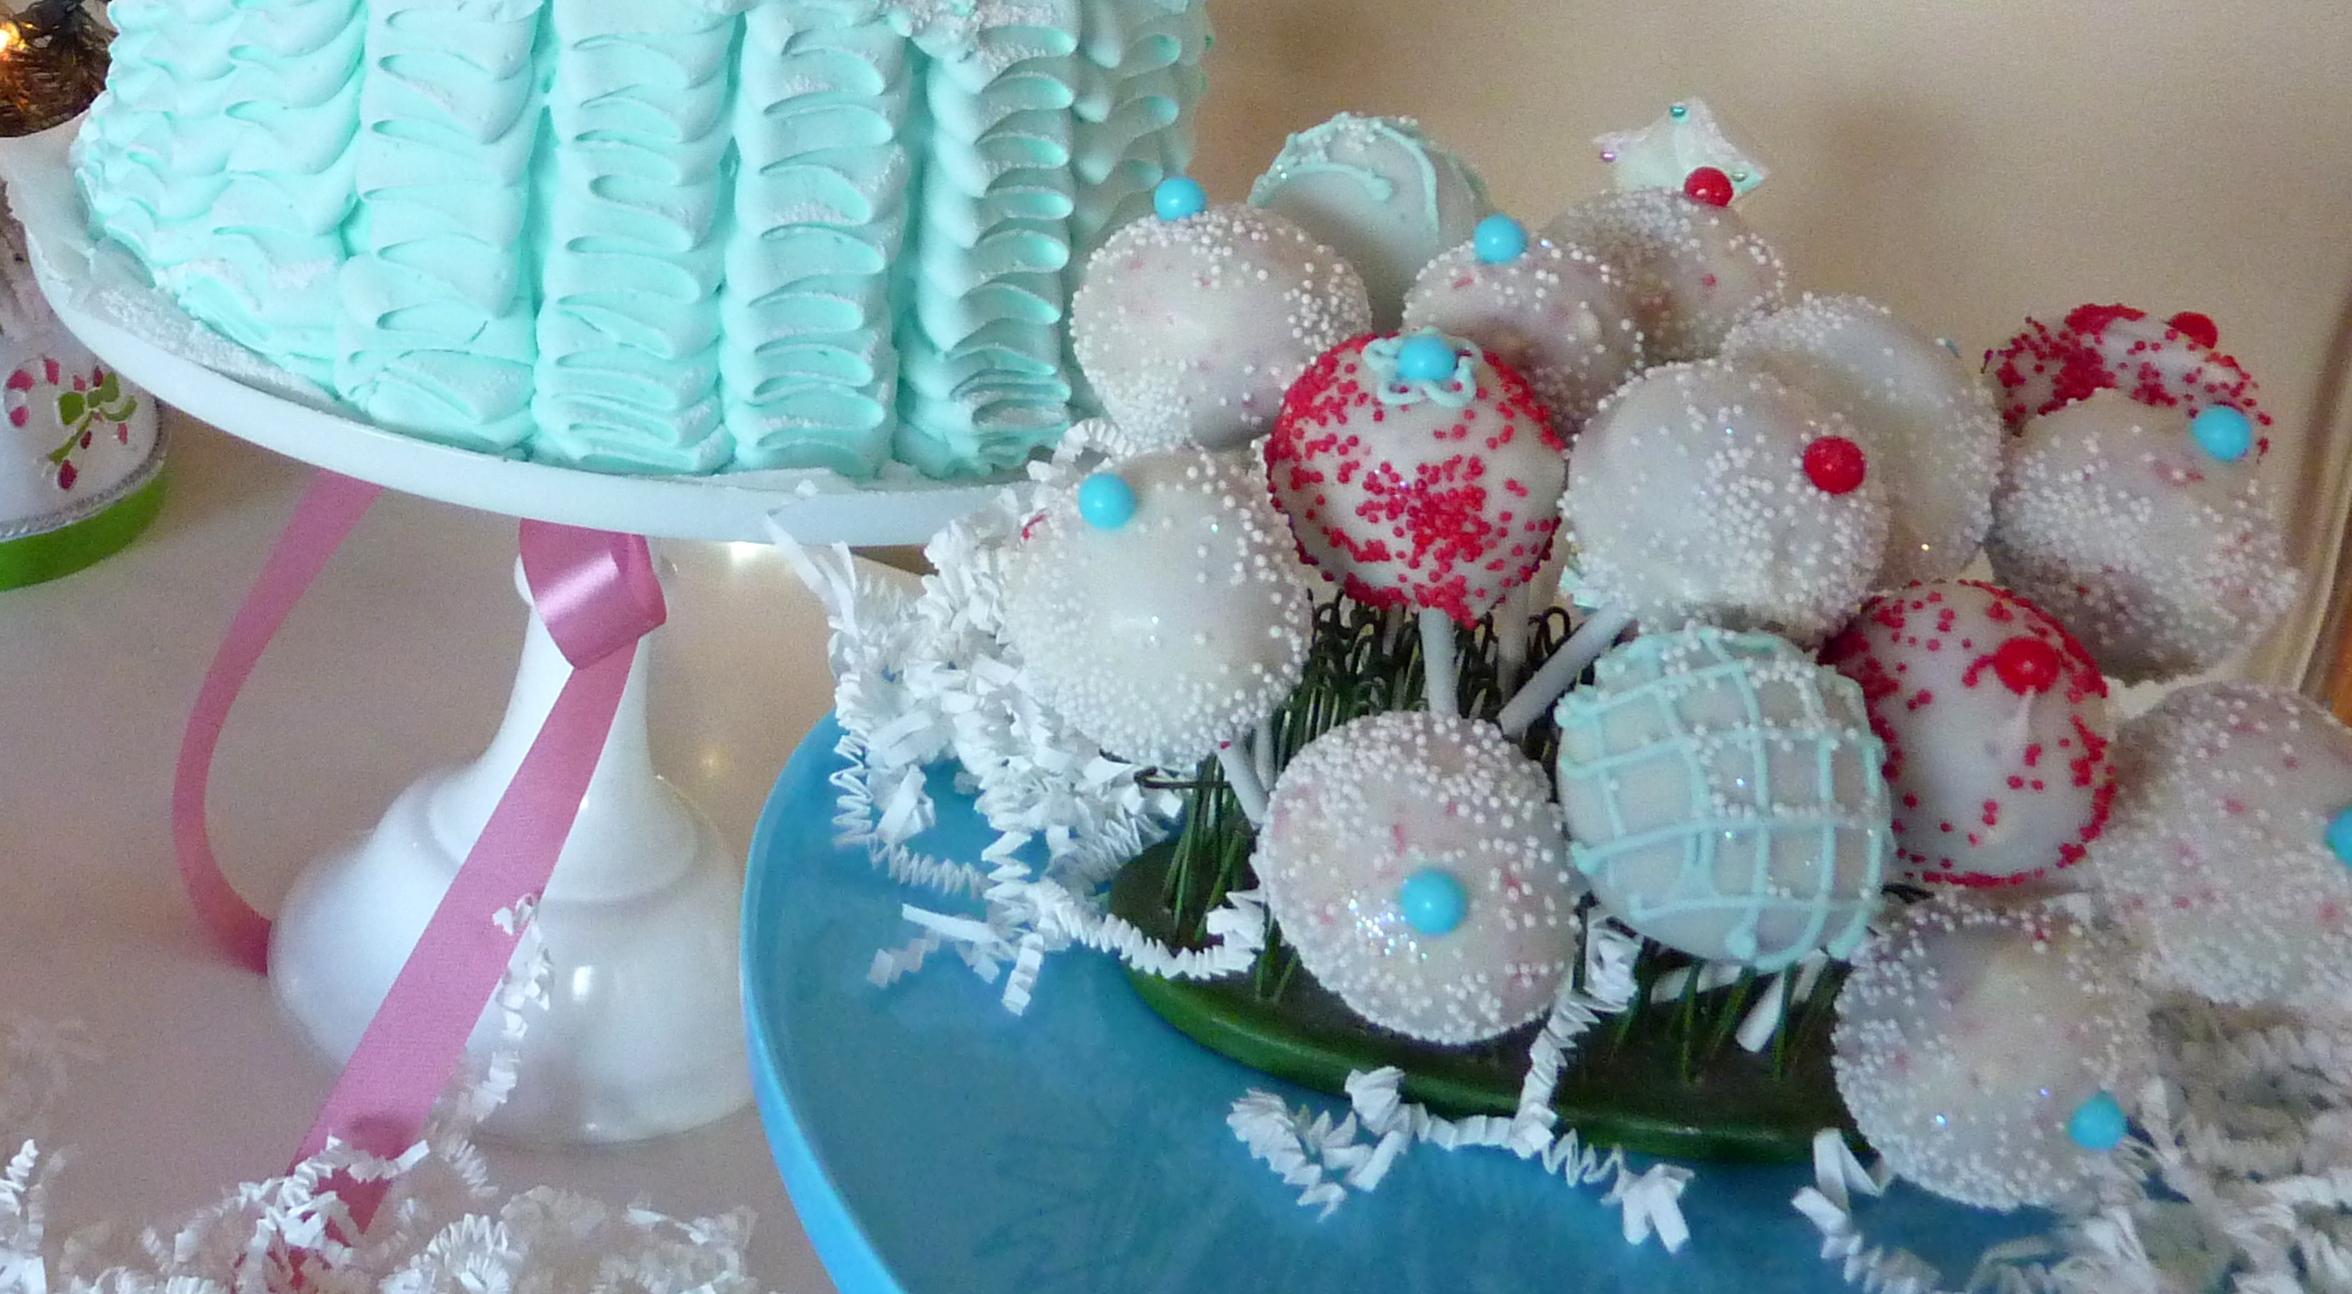 Holiday Cake Pops.jpg